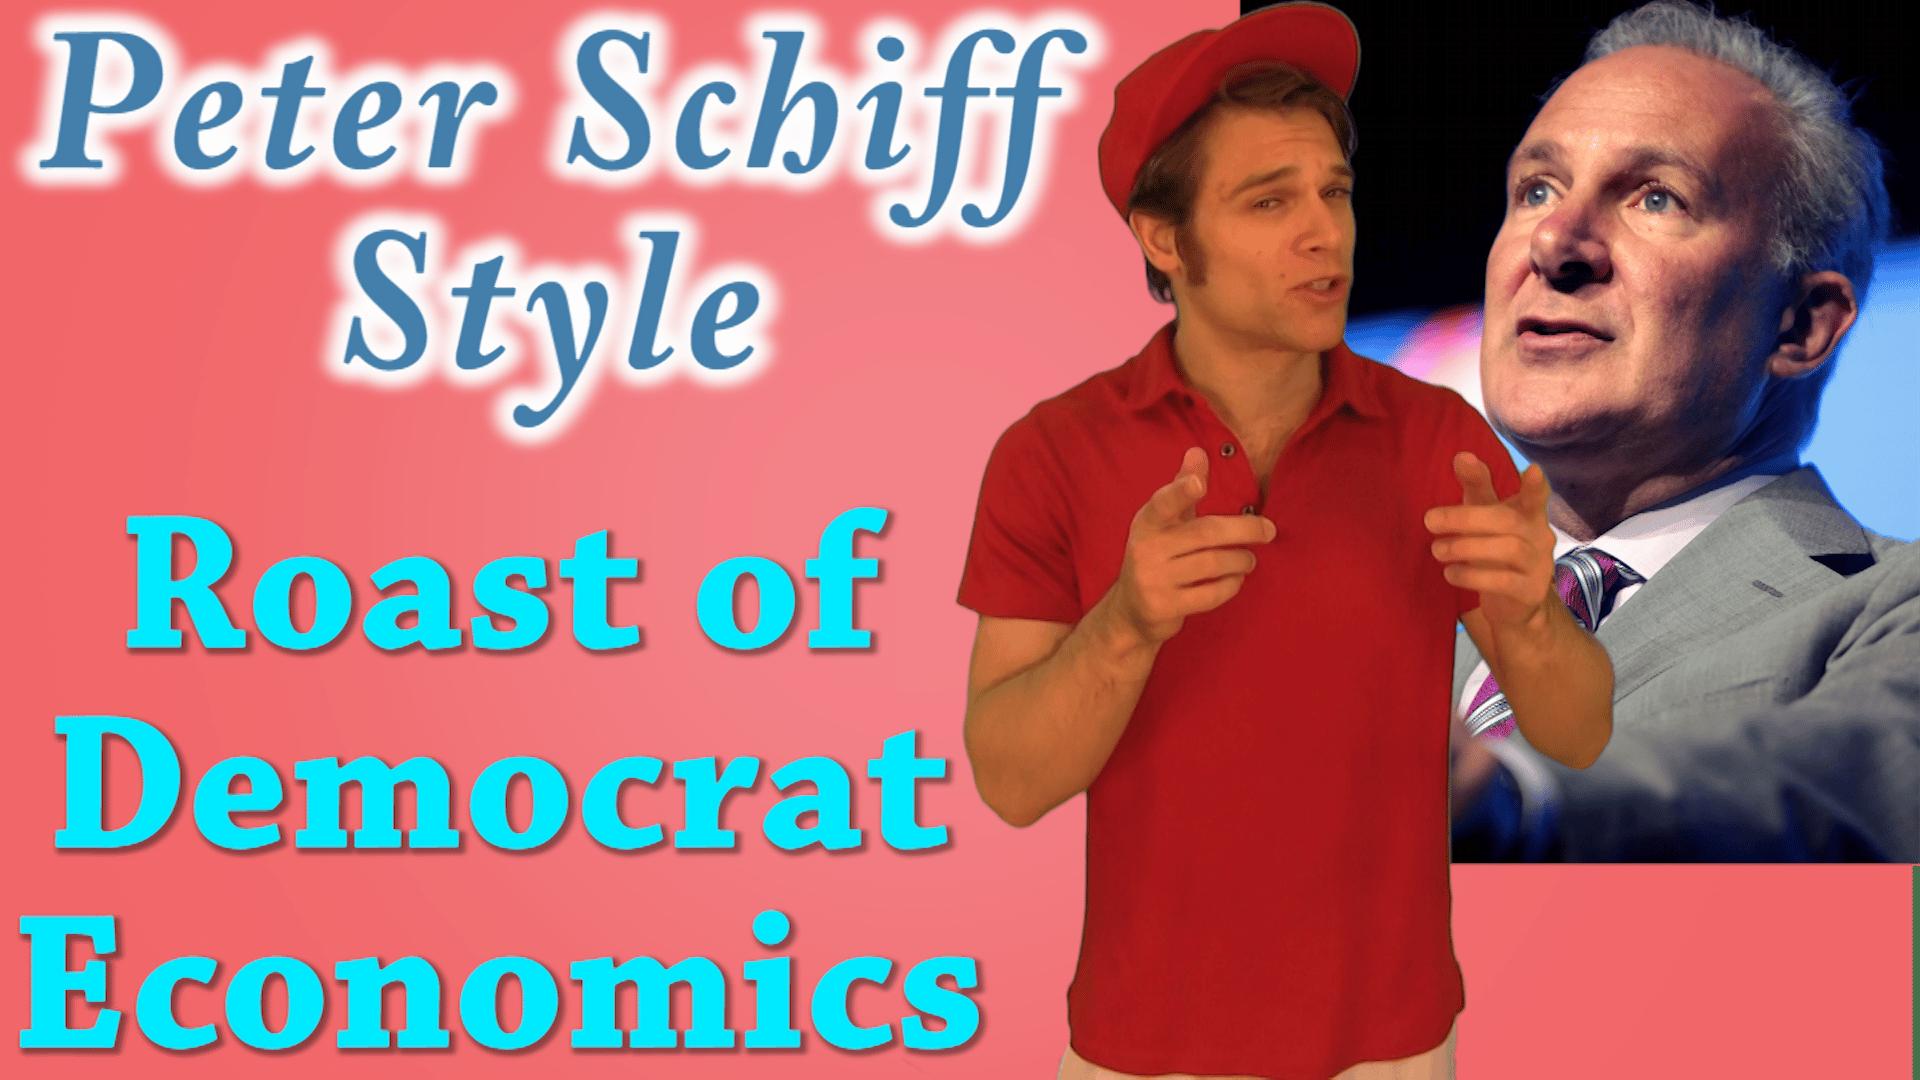 Peter Schiff Style, Roast of Democrat Economics